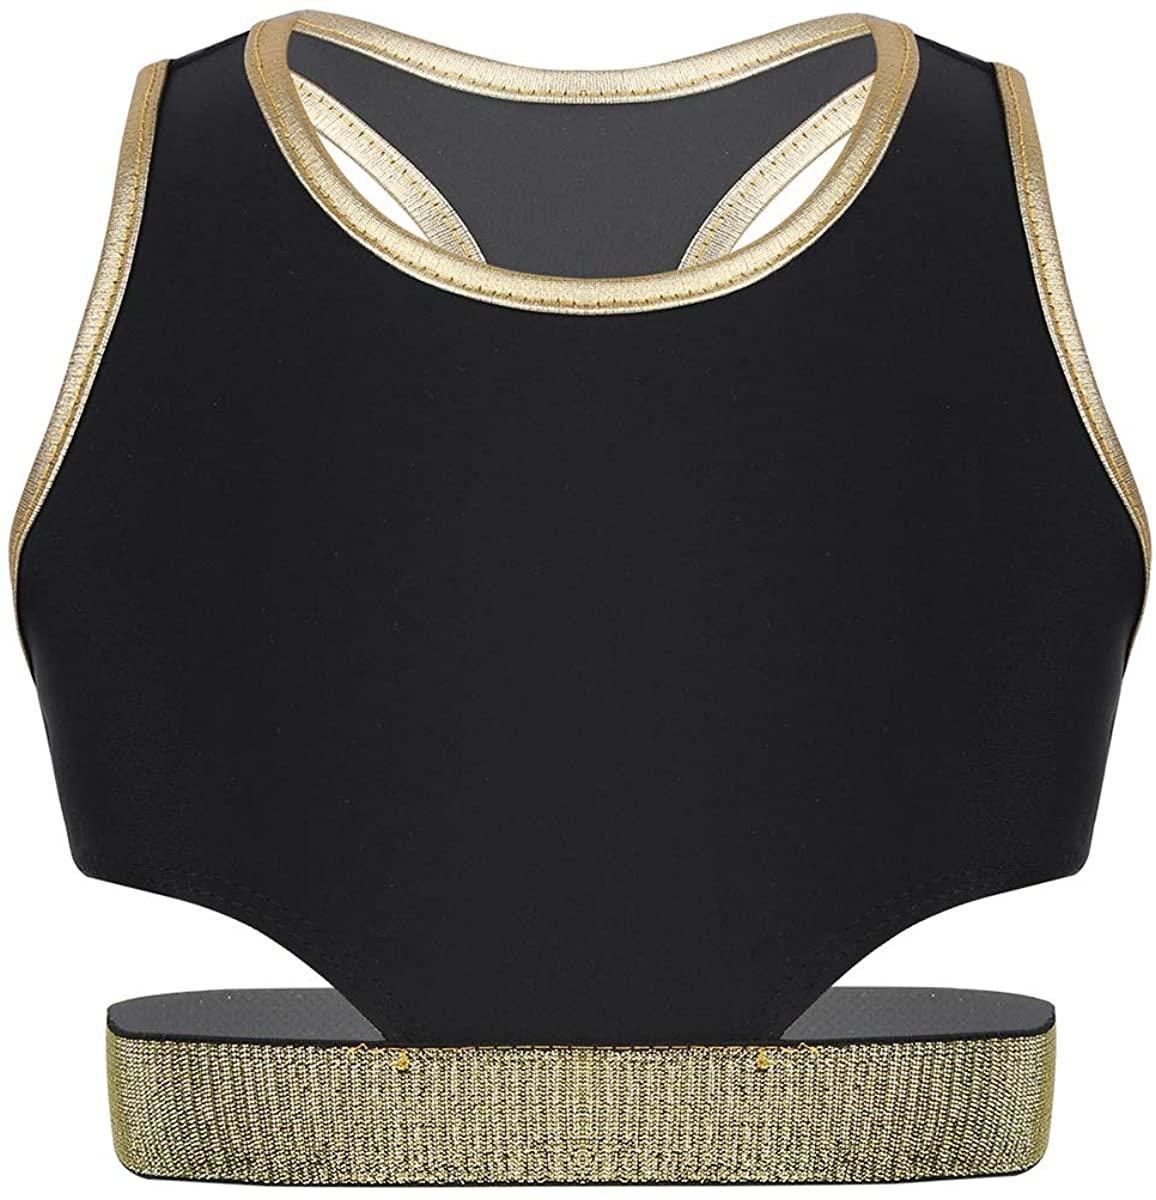 QinCiao Girls Racer Back Sports Bra Athletic Crop Top Yoga Gym Fitness Training Vest Tank Top T Shirt